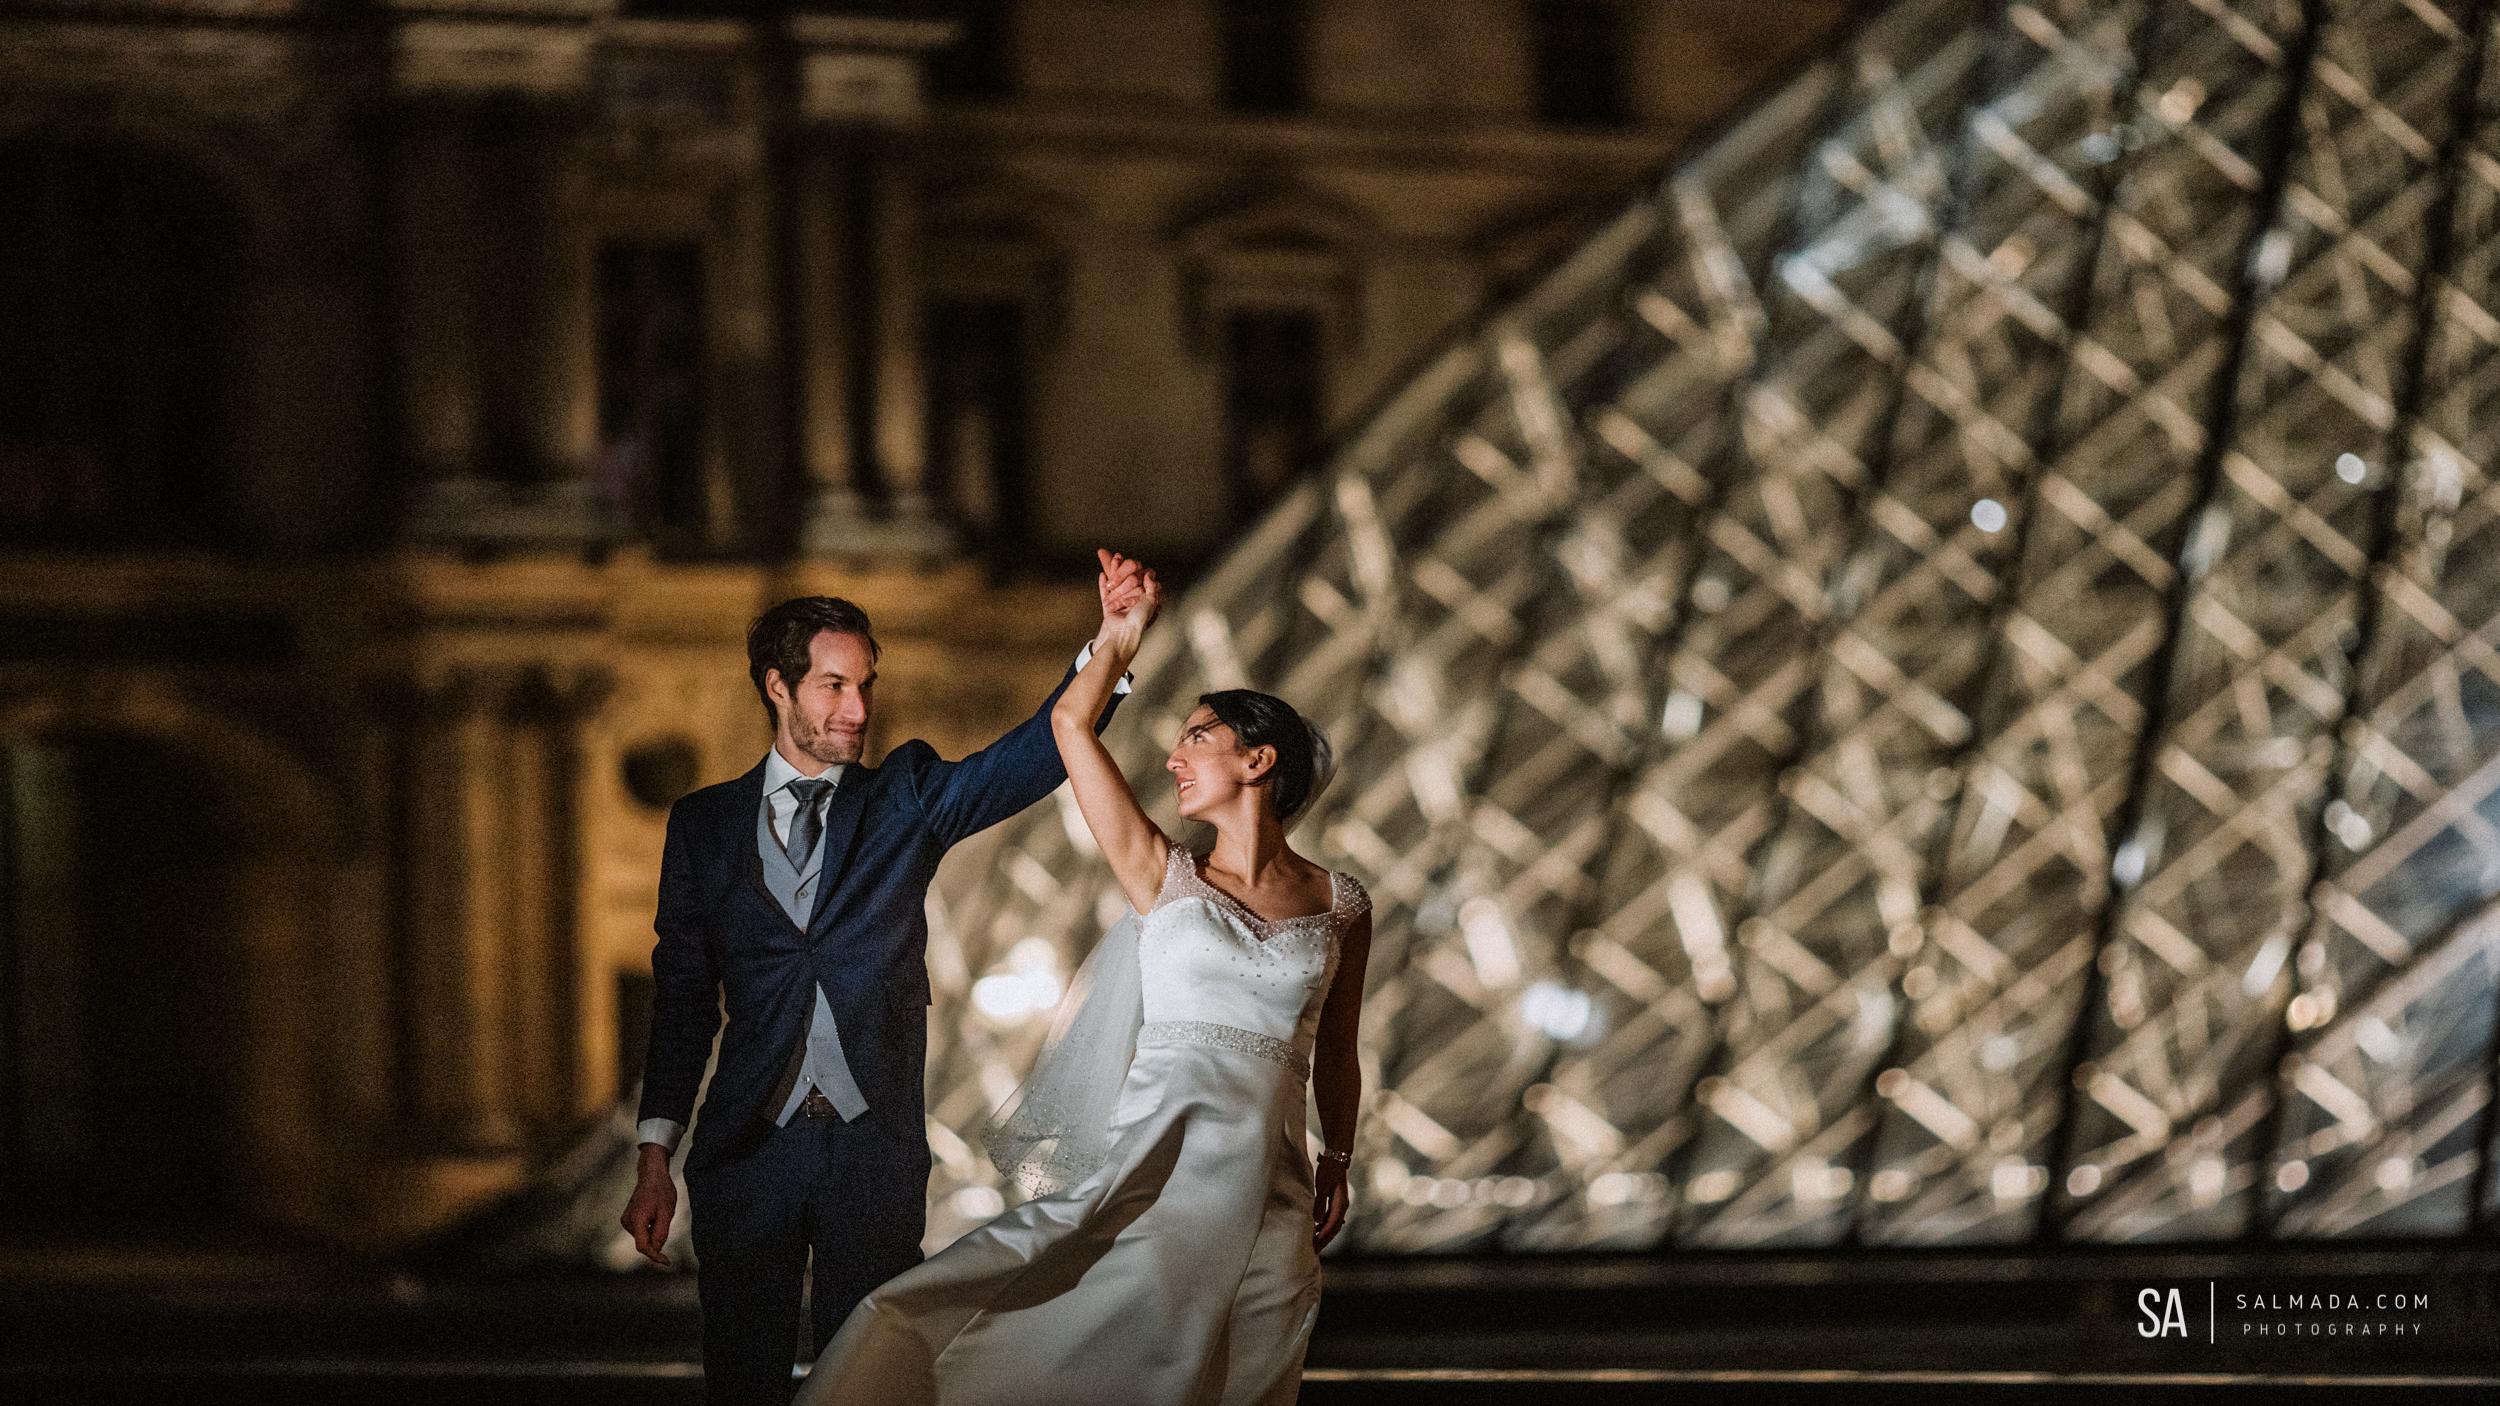 The Louvre Paris Wedding.jpg